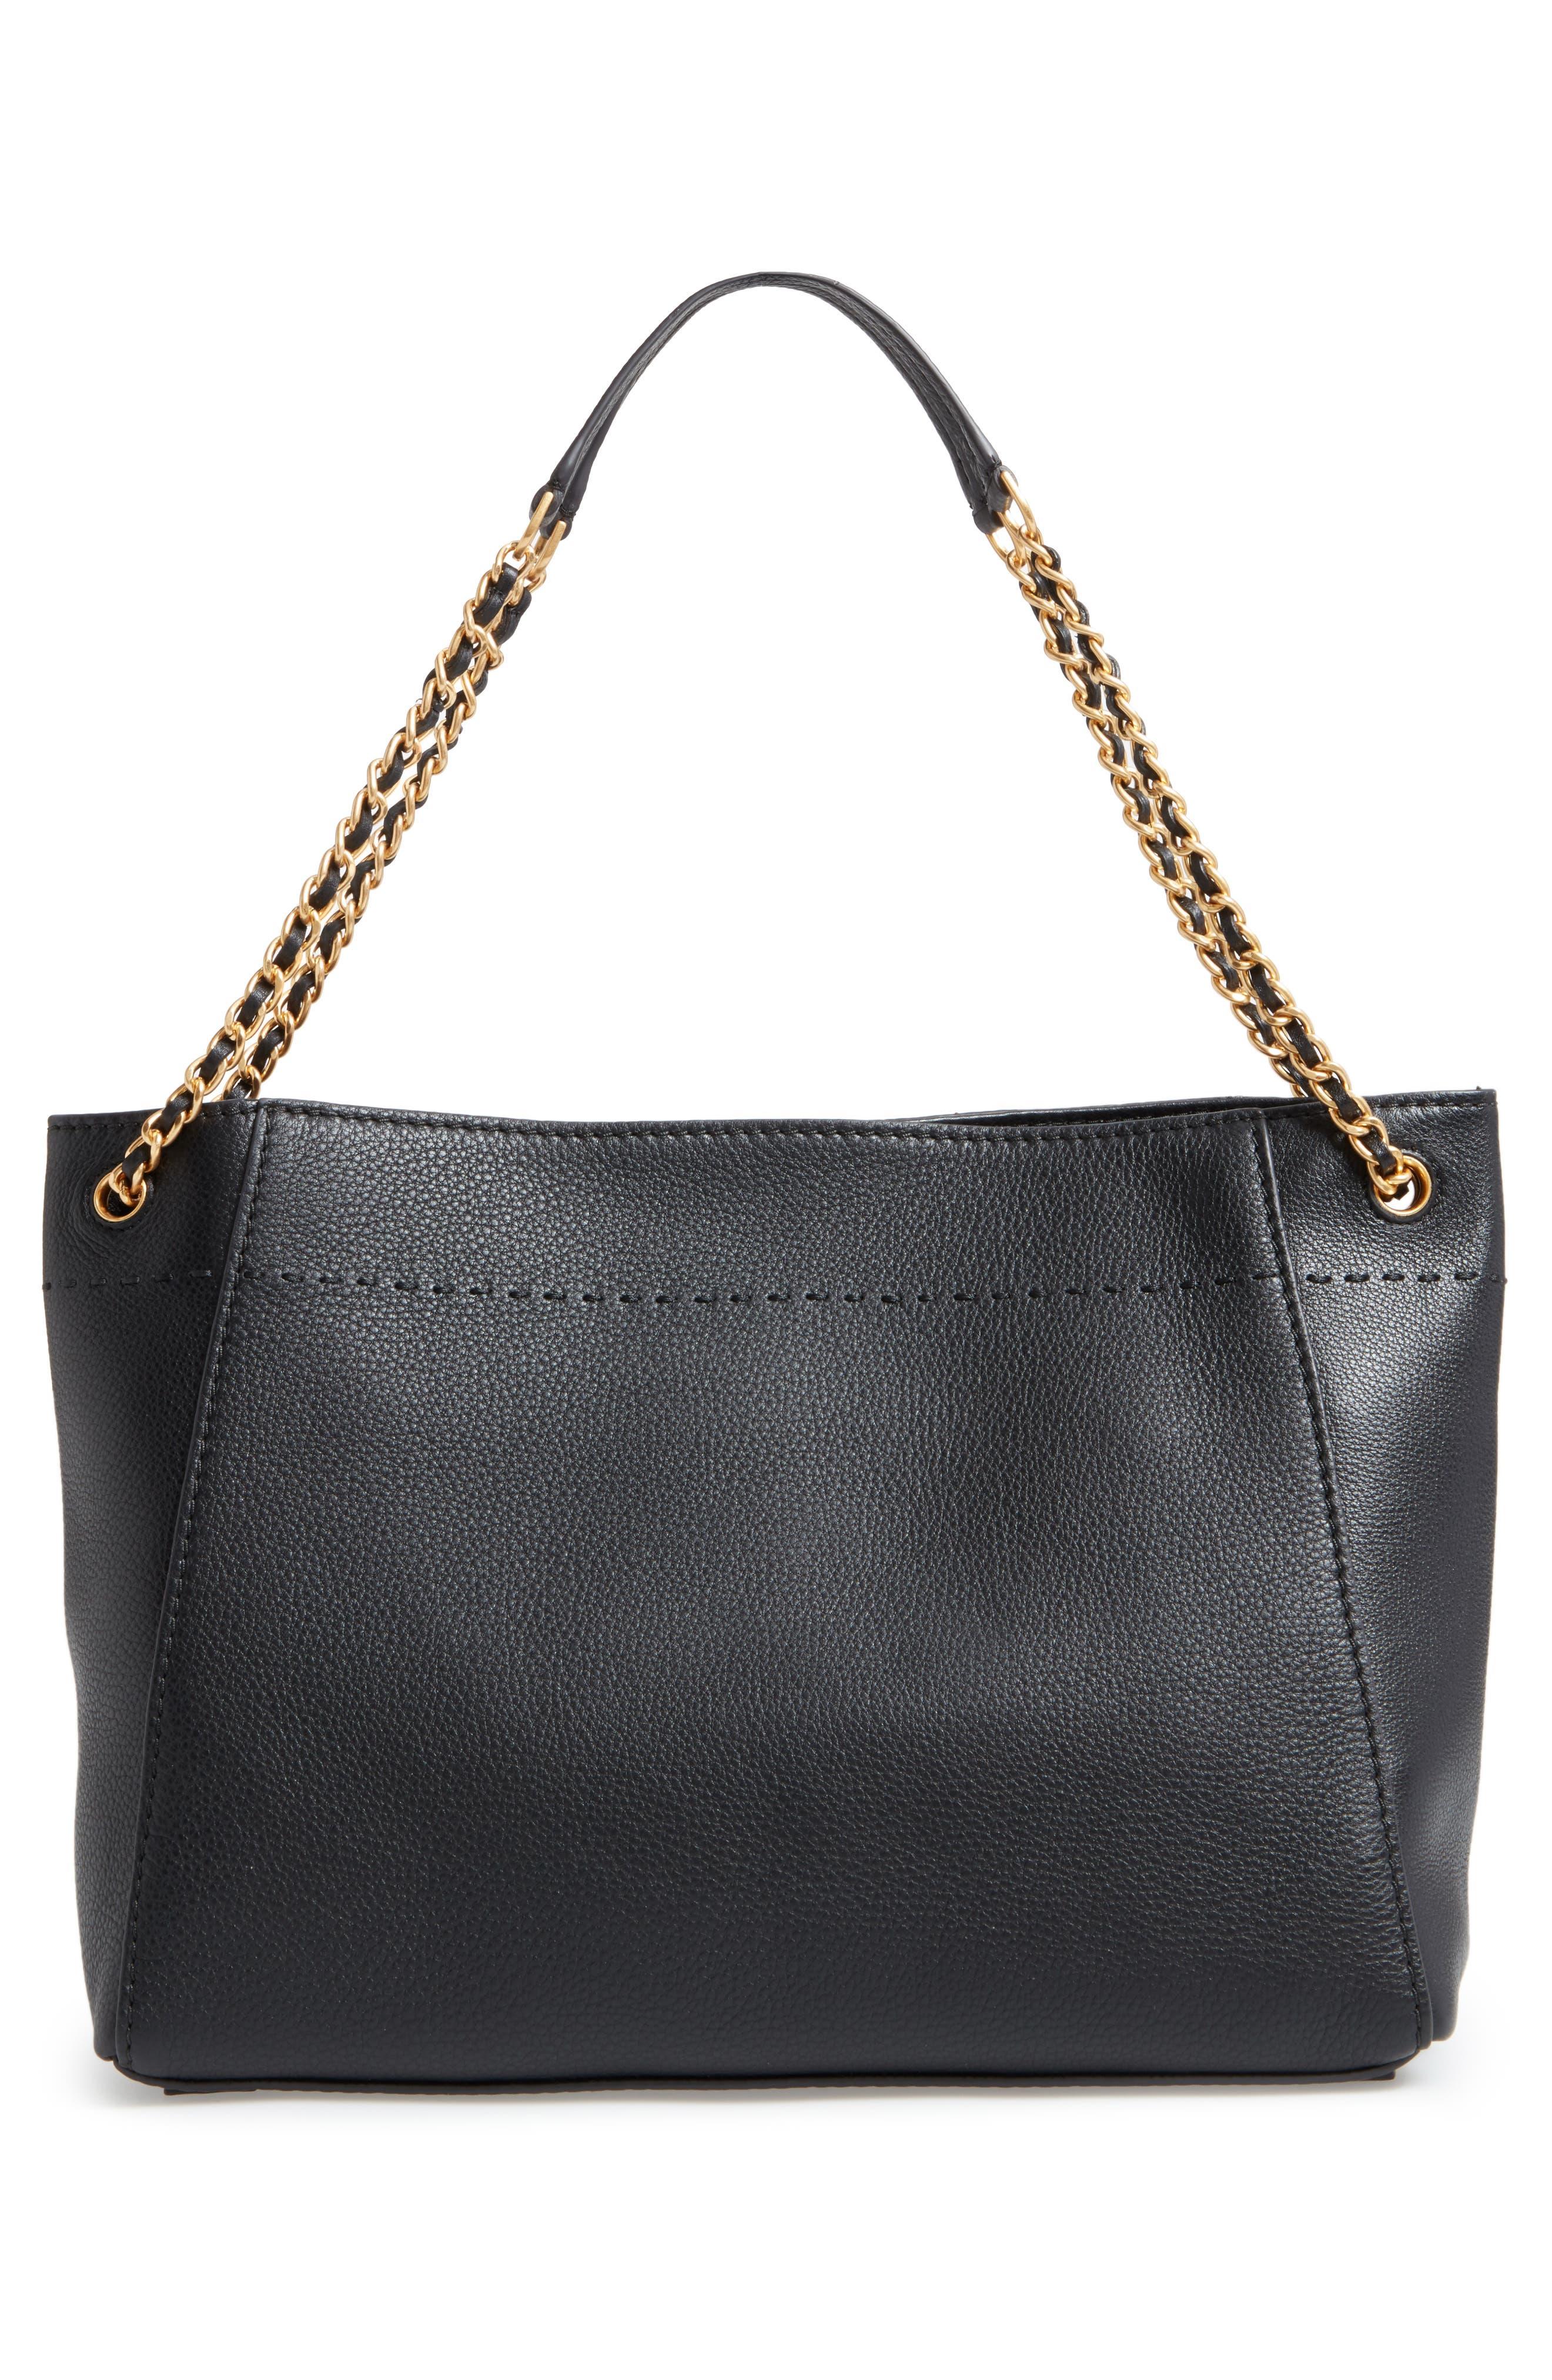 McGraw Slouchy Leather Shoulder Bag,                             Alternate thumbnail 3, color,                             Black